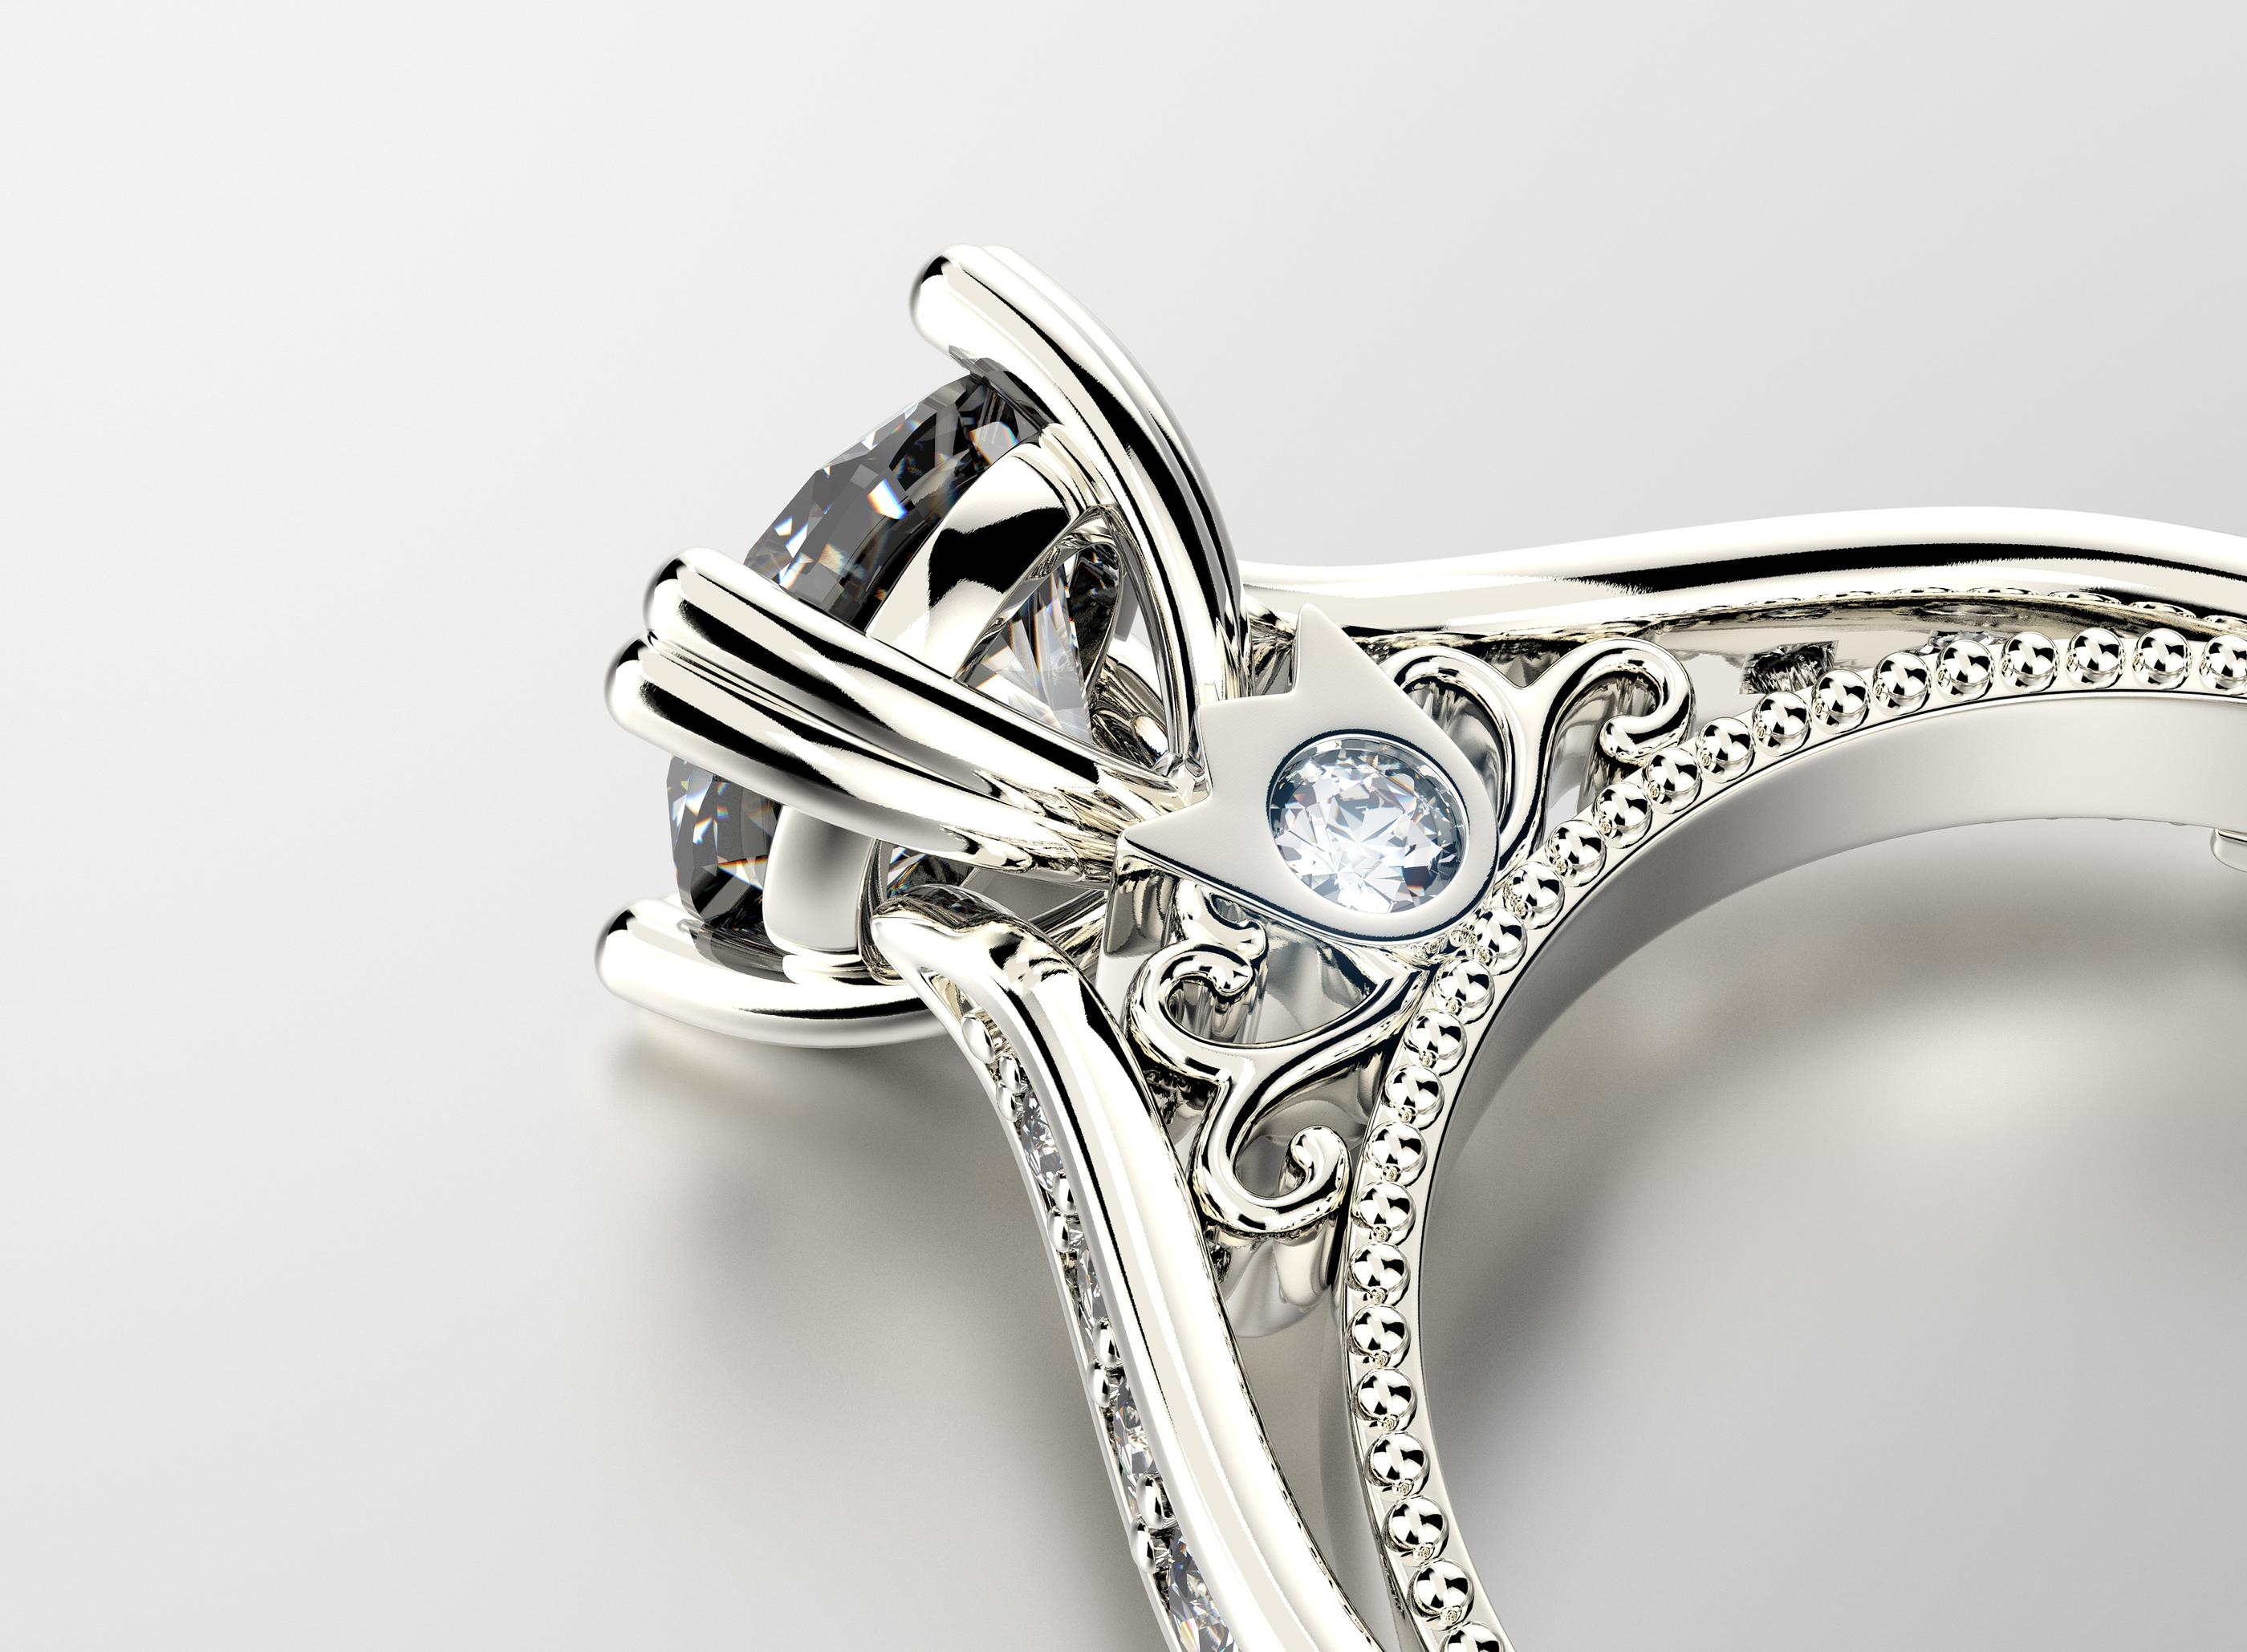 Wholesaler Vs Retailer When Buying A Diamond Engagement Ring Diamond Hedge